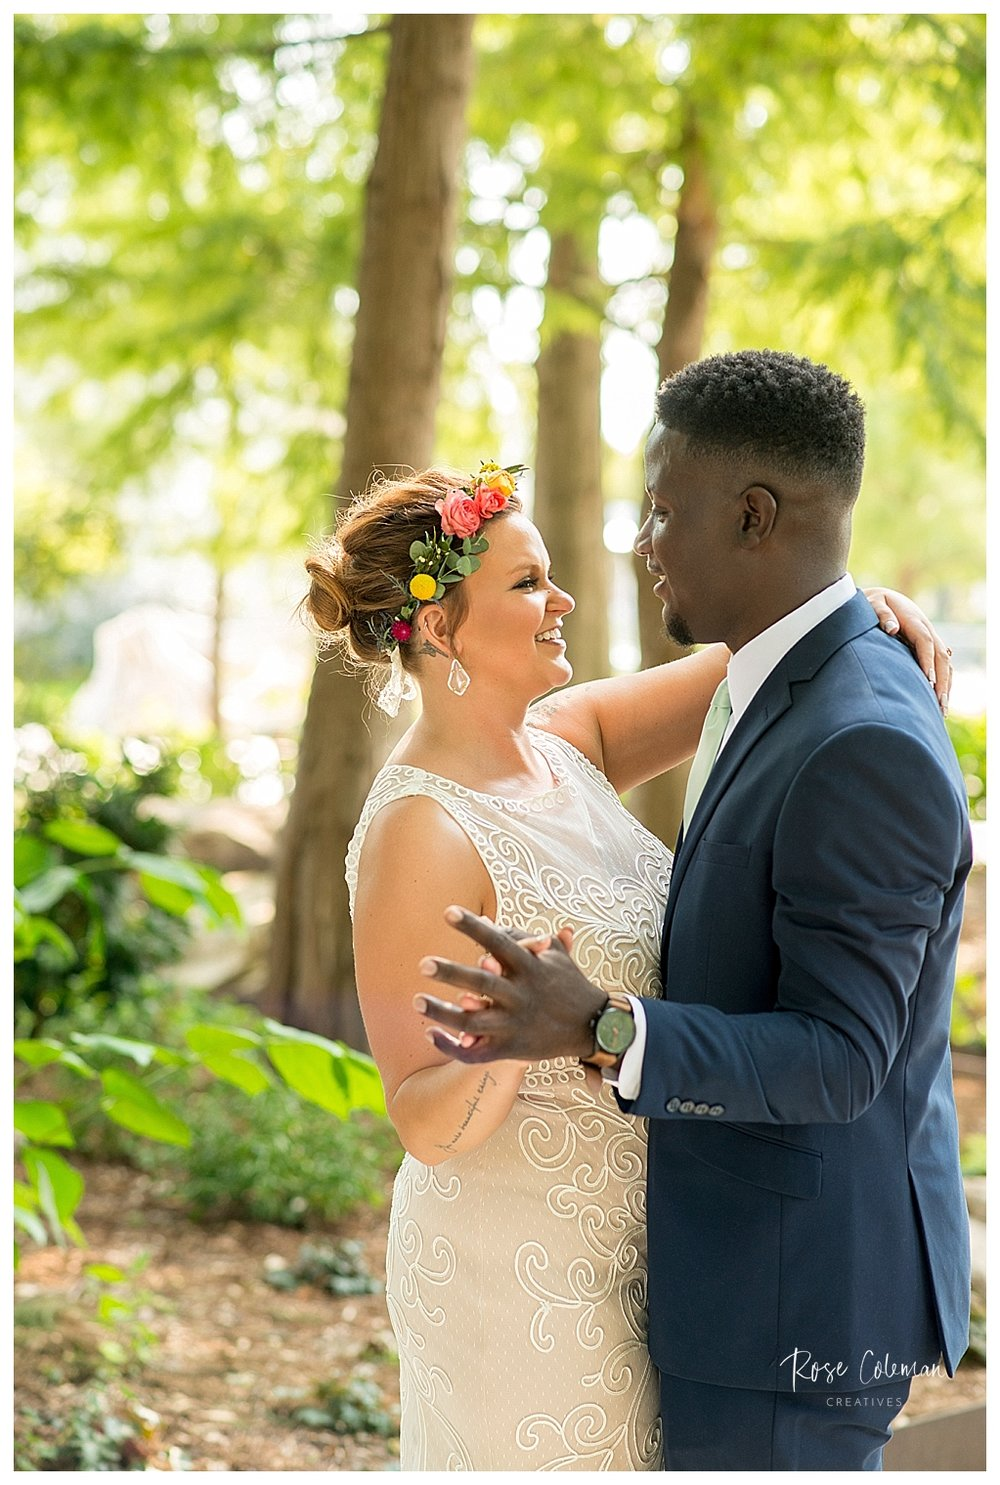 Rose_Coleman_Creatives_OKC_Wedding_Photography_Myriad_Gardens_140.jpg